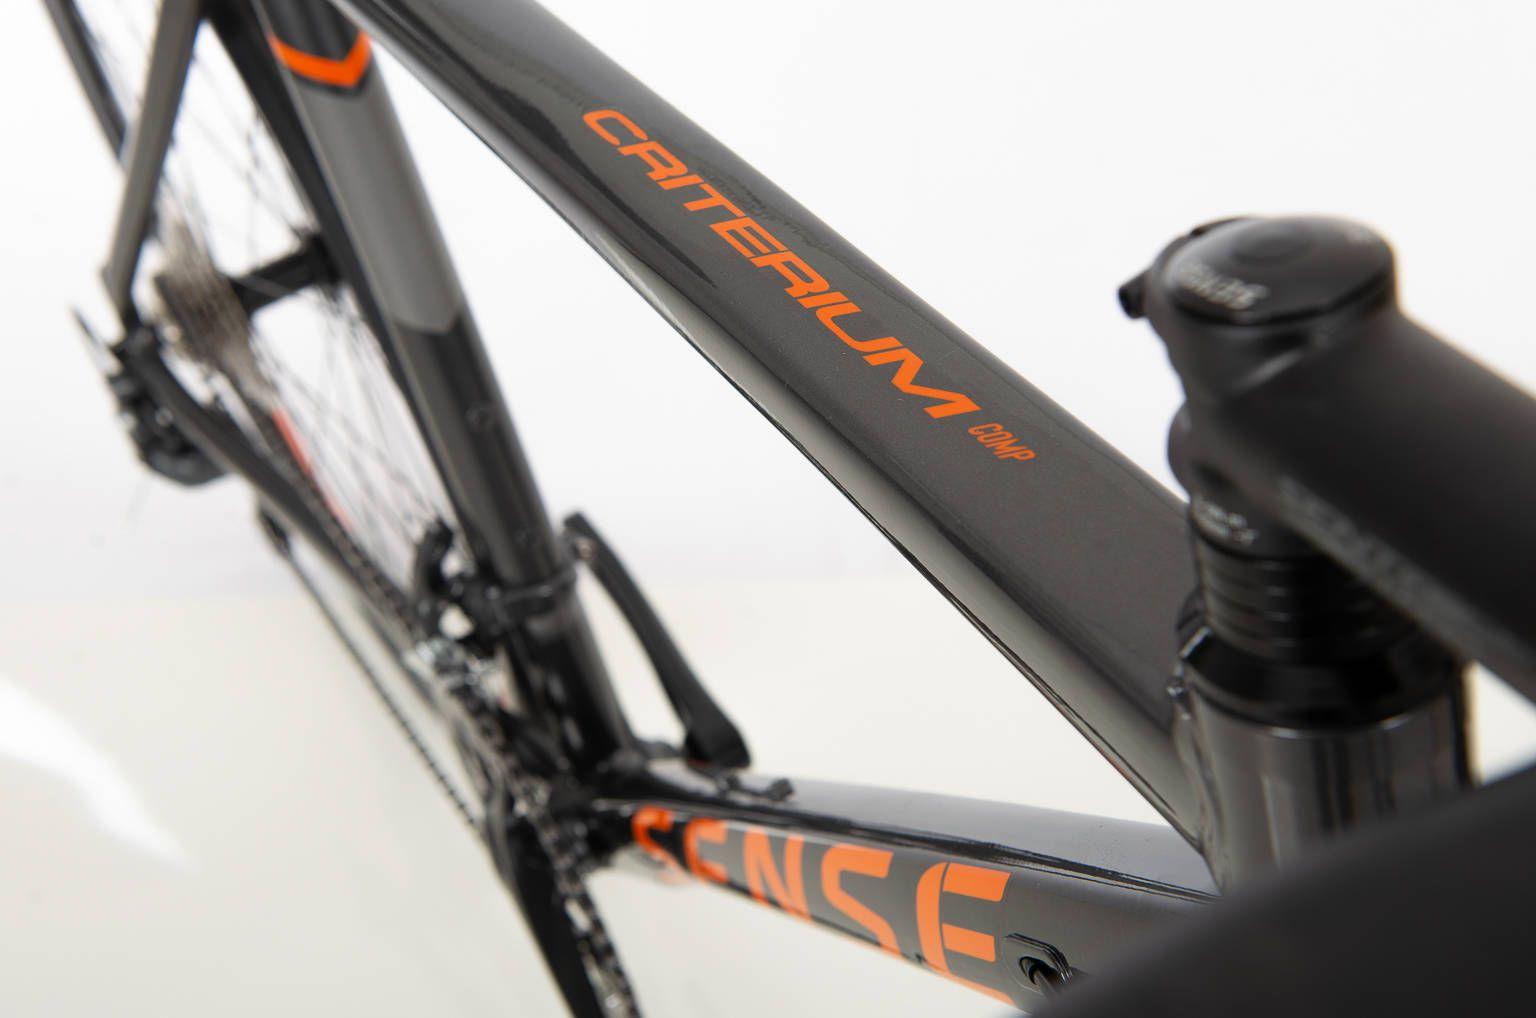 Bicicleta Sense Criterium comp 2020 Lrj/Cza 16v Claris Disco